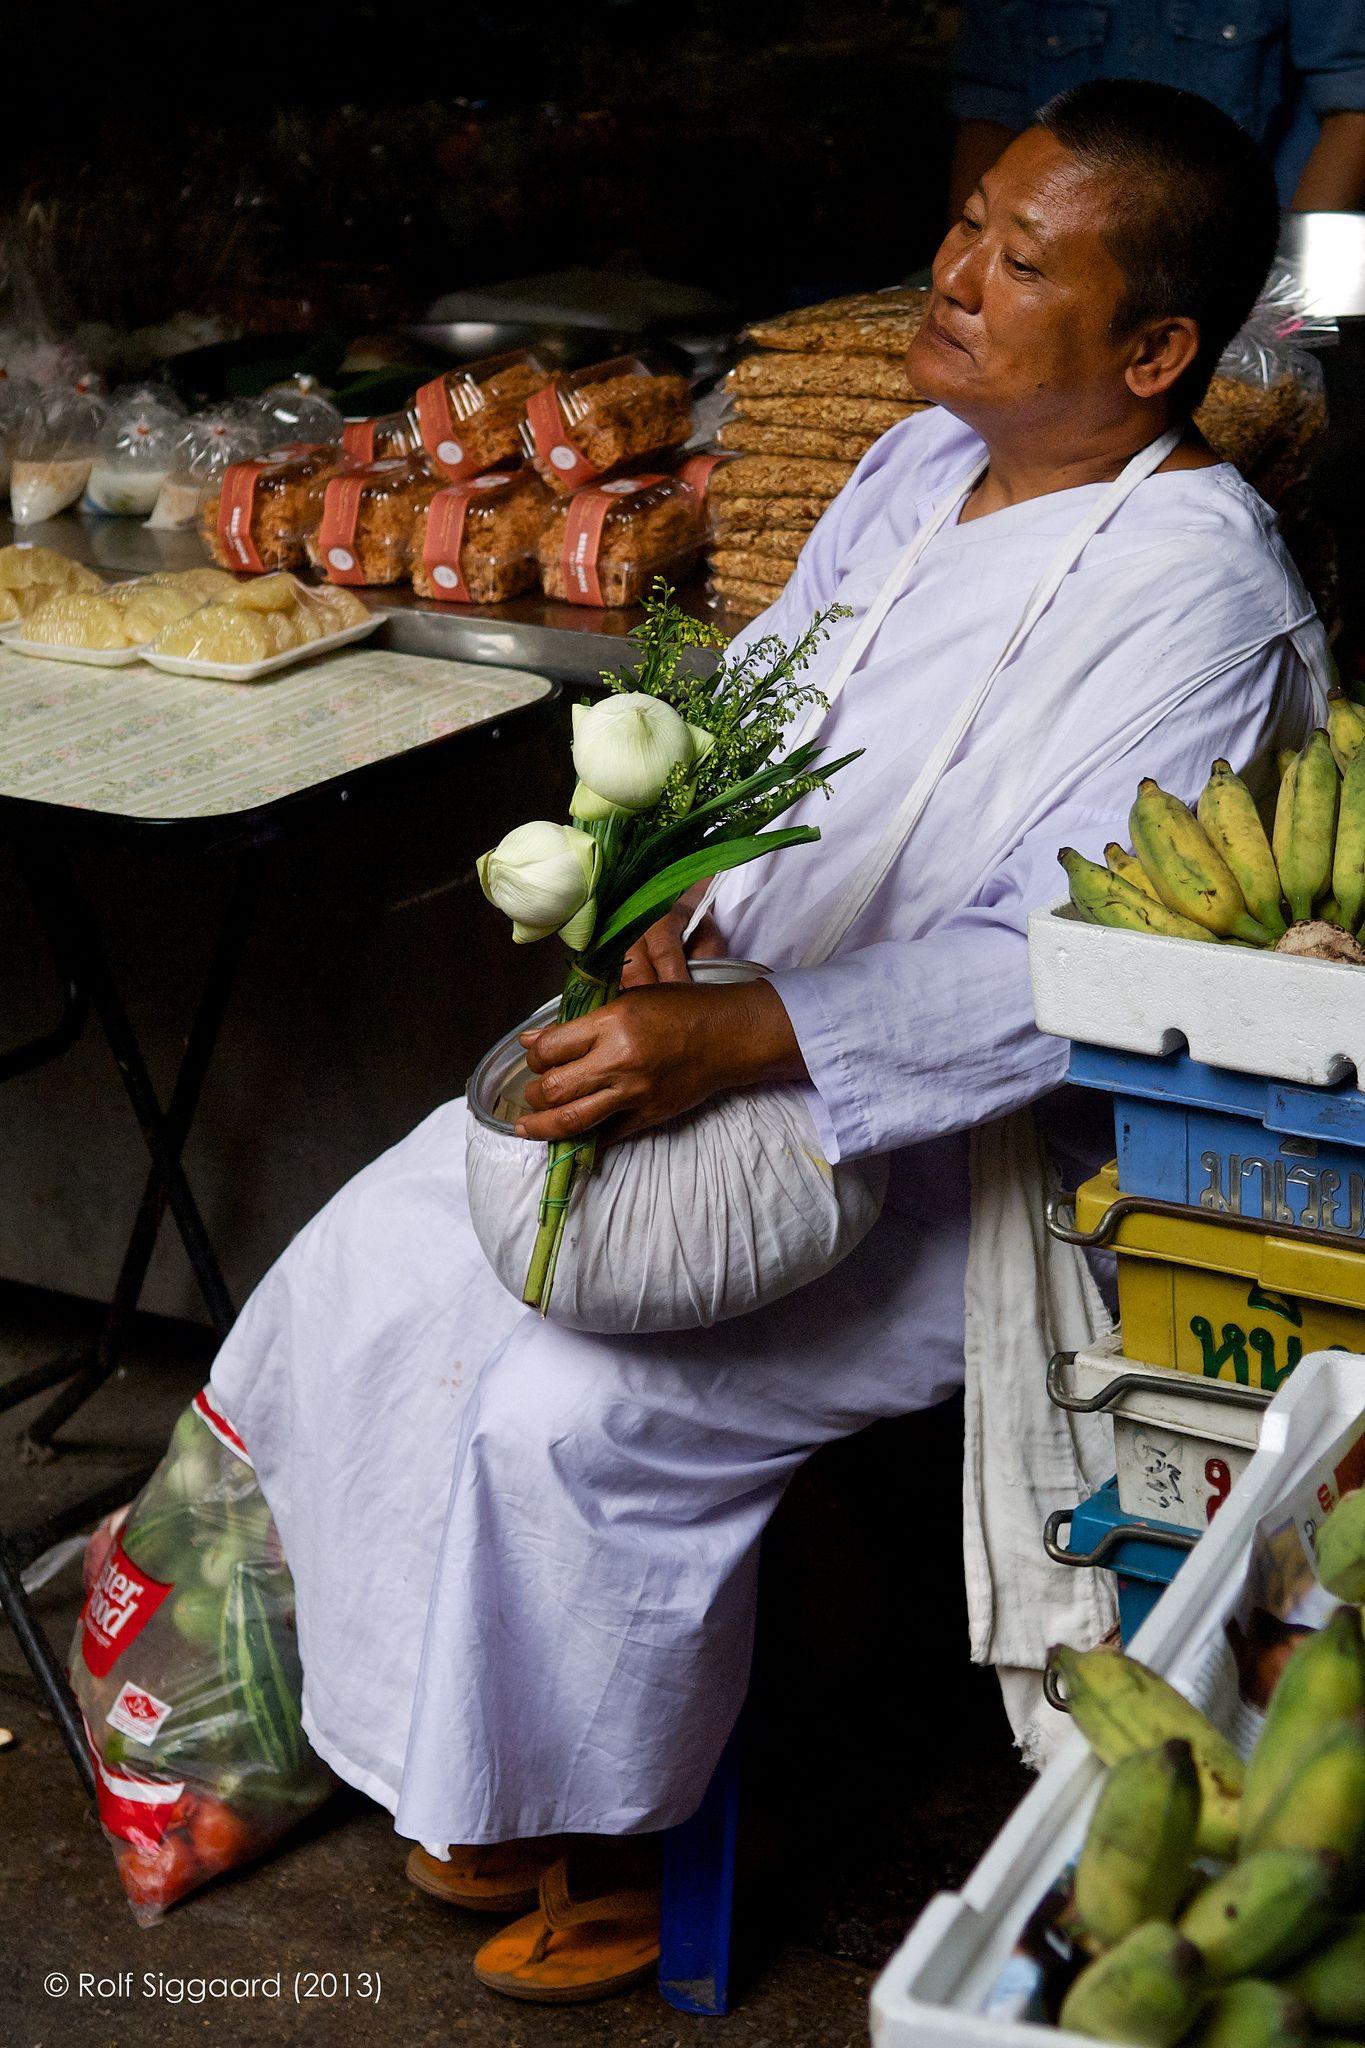 https://flic.kr/p/e1Mwfu   Thailand Street Market #1   Hua Hin, Thailand